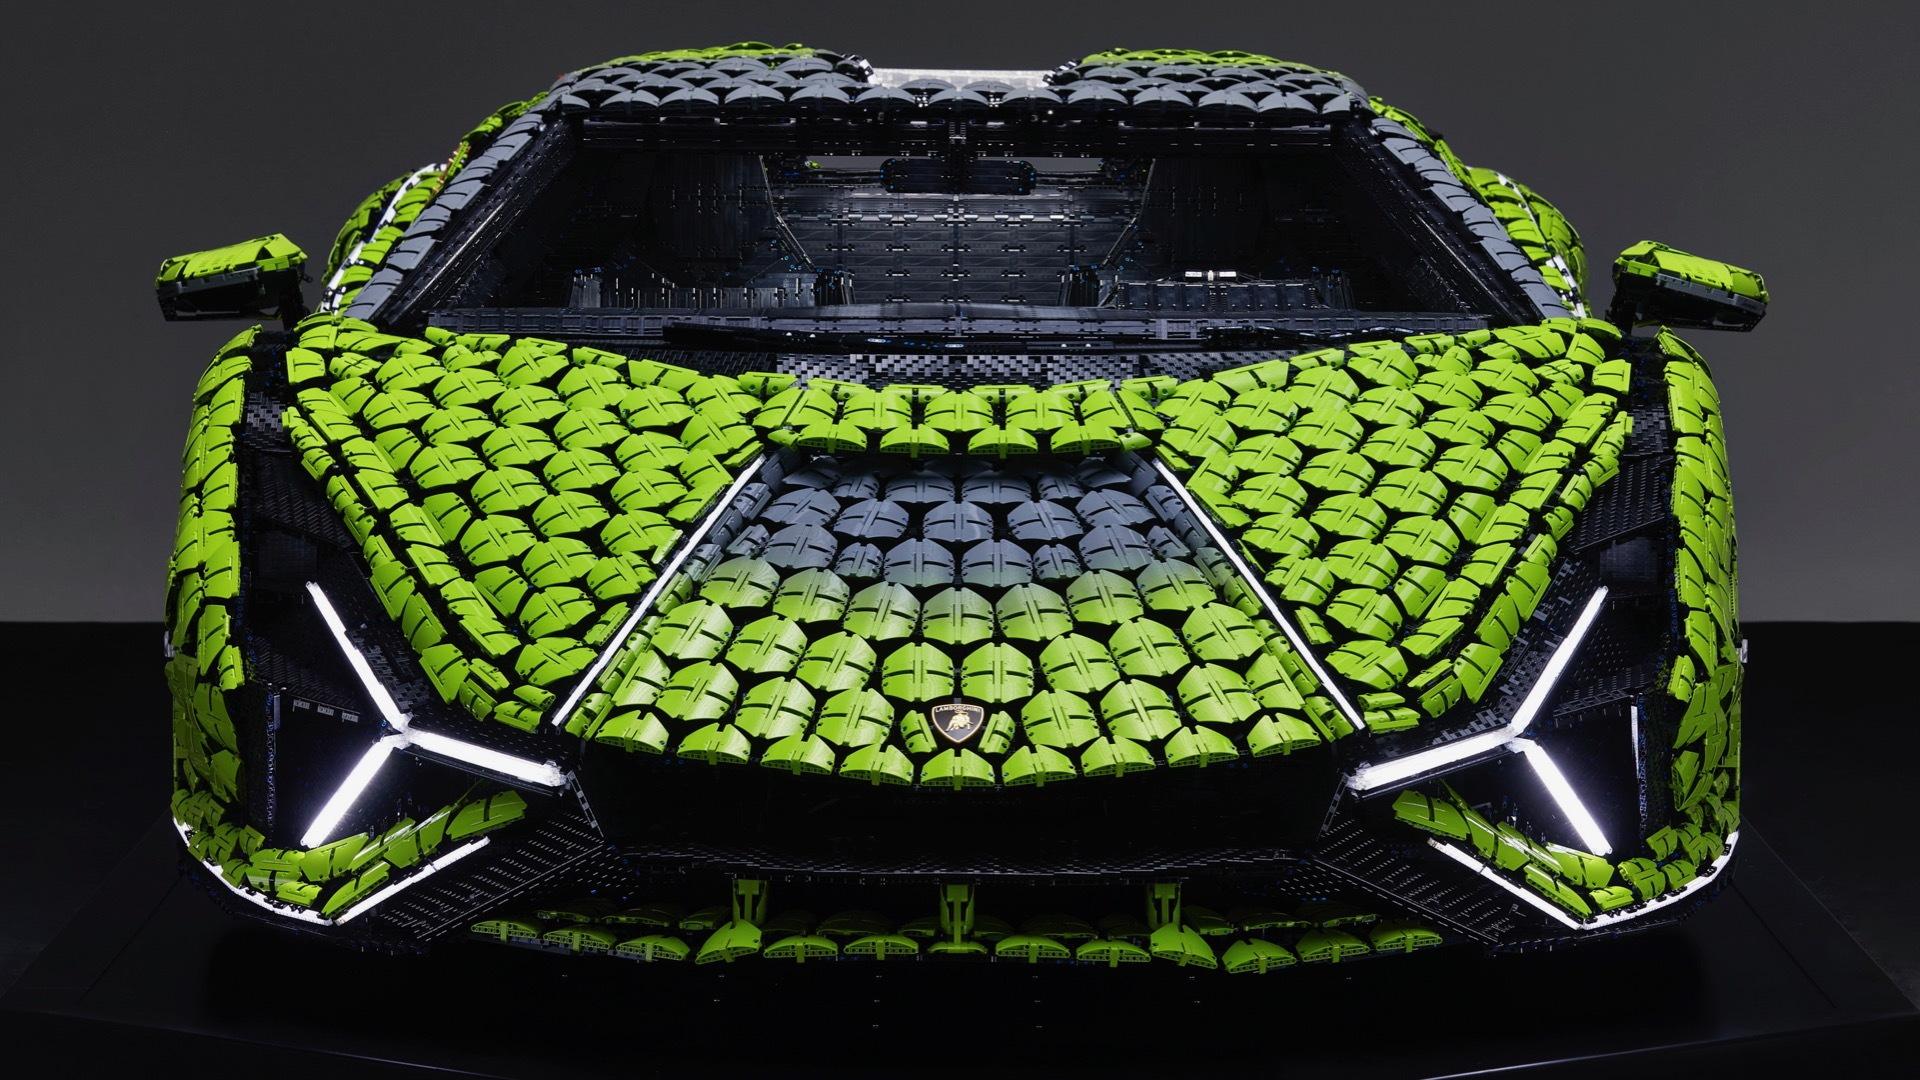 Life-size Lego Lamborghini Sián FKP 37